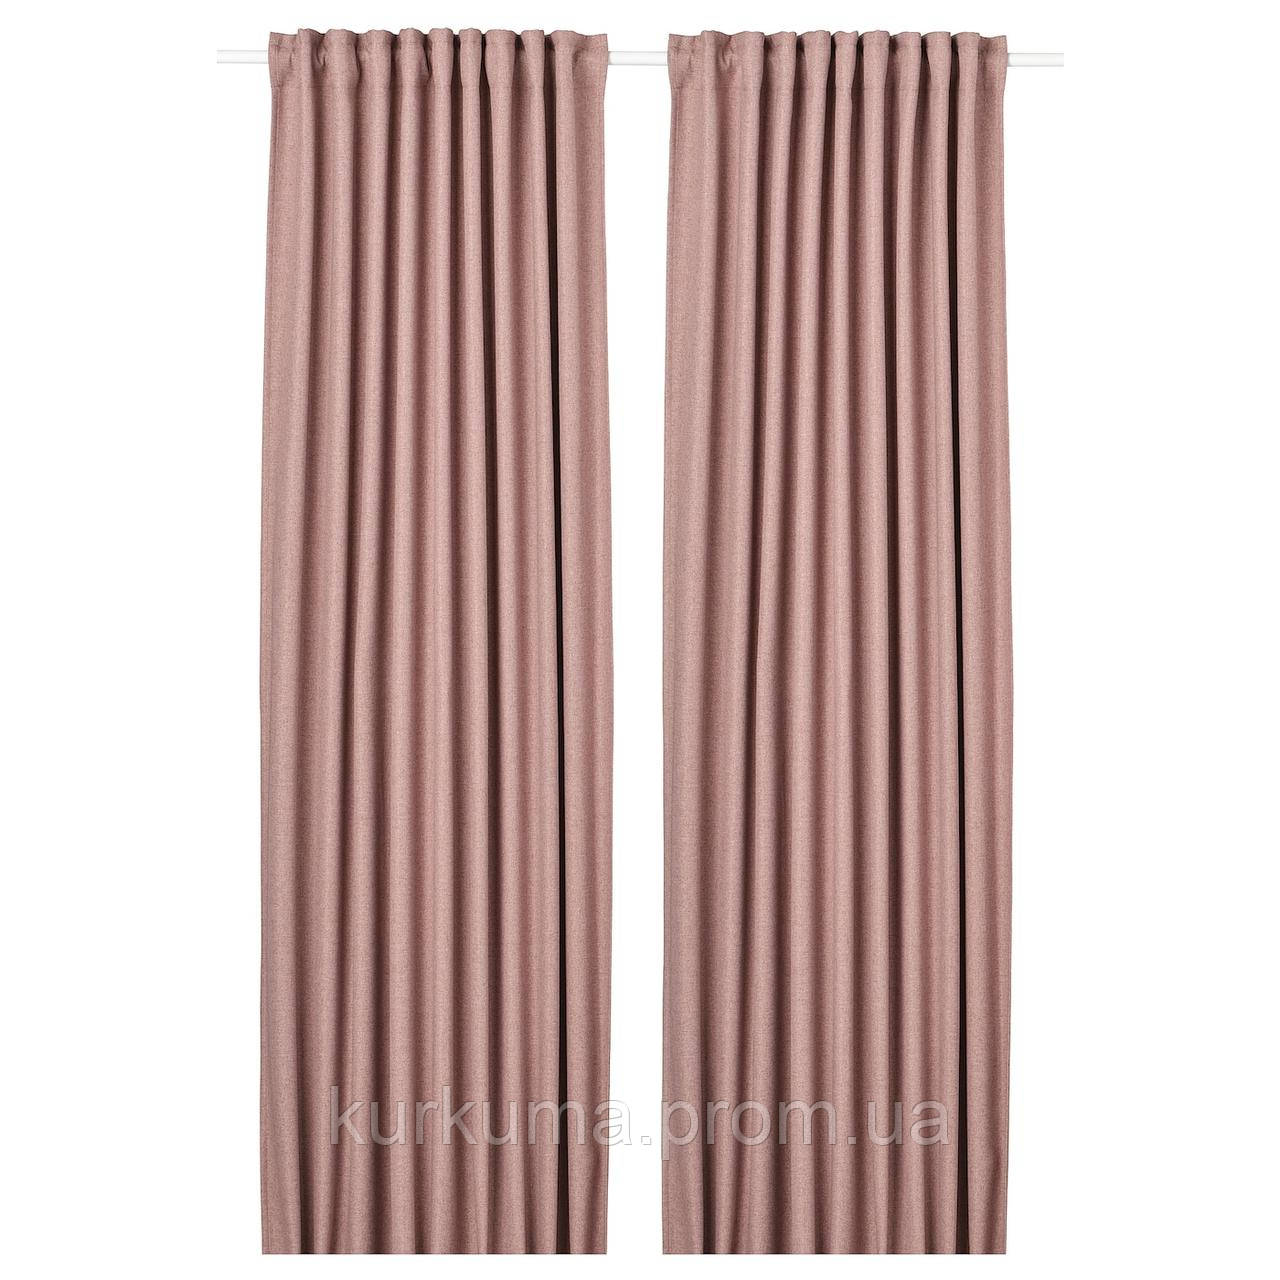 IKEA ANNAKAJSA Гардины, 1 пара, розовый, 145x300 см (804.629.97)